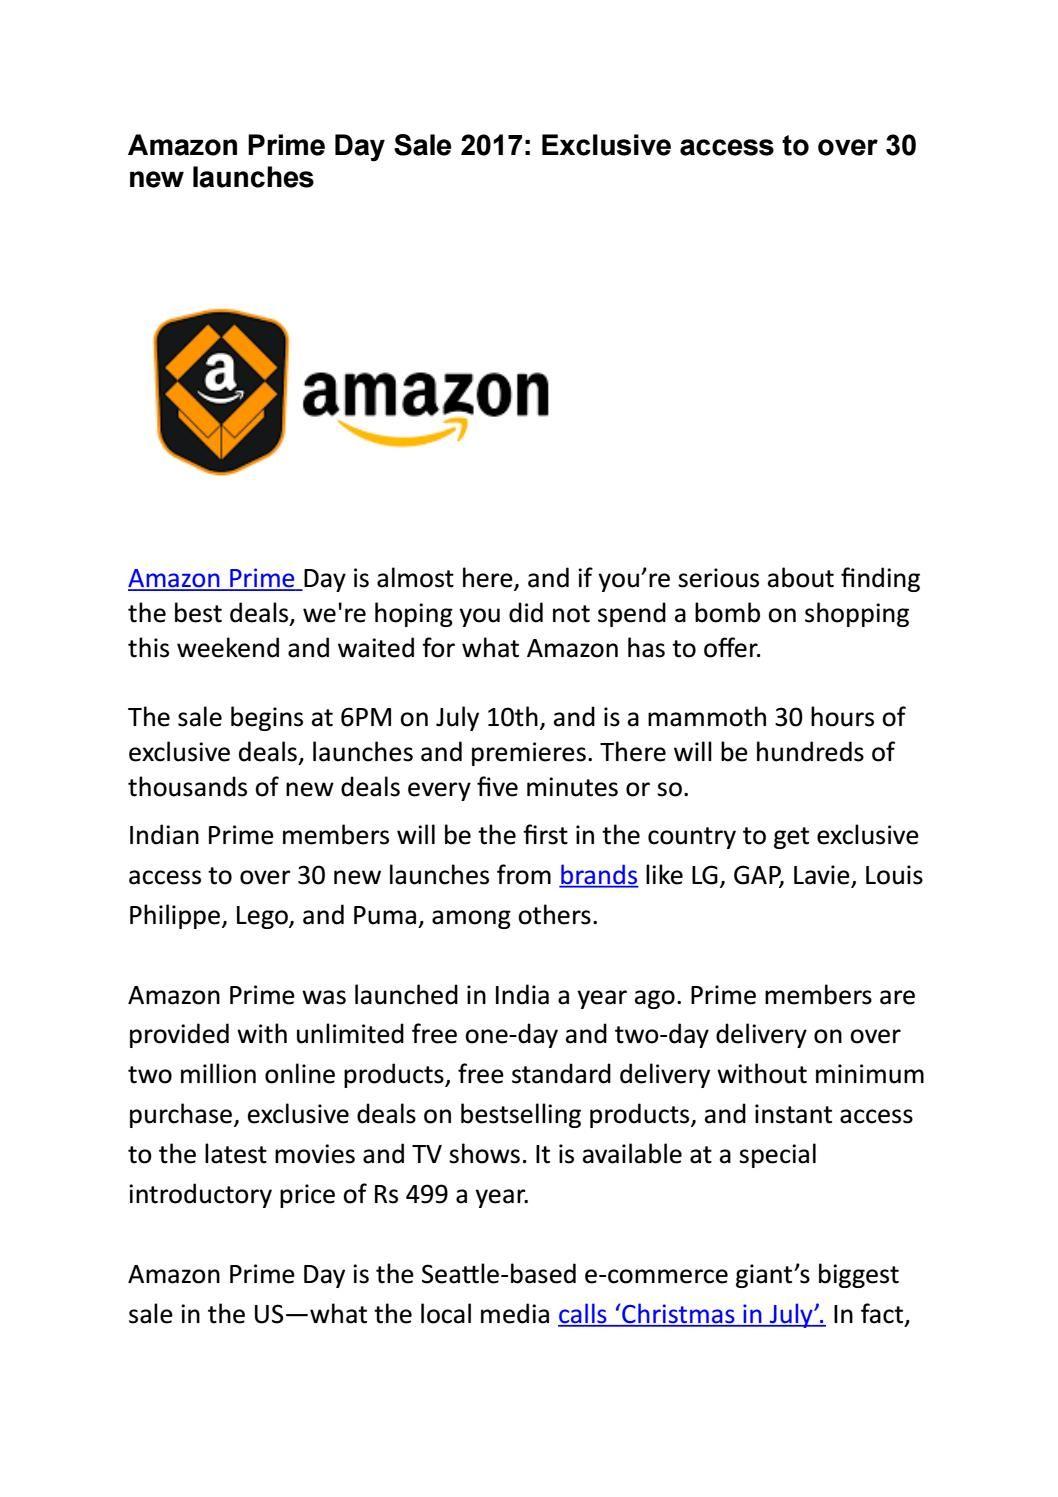 Amazon Prime Day Sale 2017 Amazon Prime Day Prime Day Amazon Prime